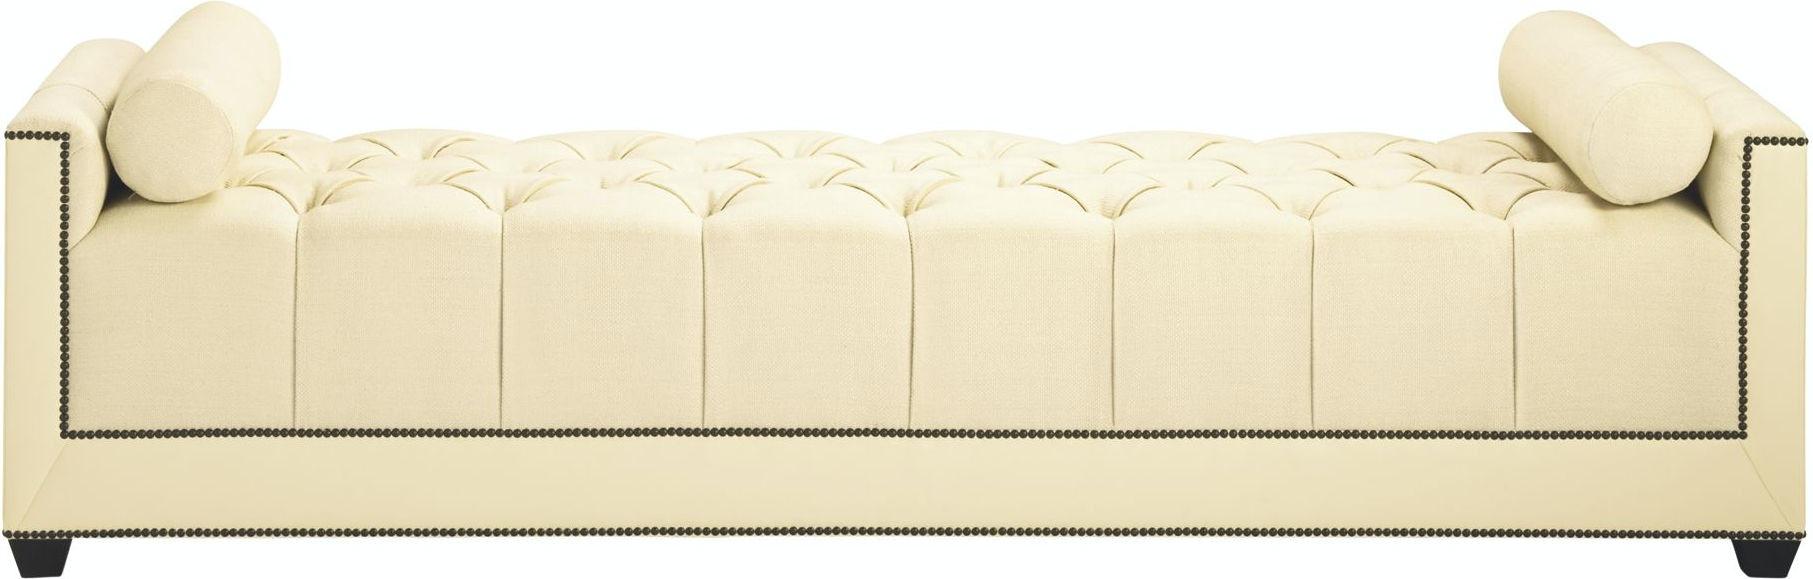 Baker Furniture 6369 85 Living Room Thomas Pheasant Paris Chaise Lounge